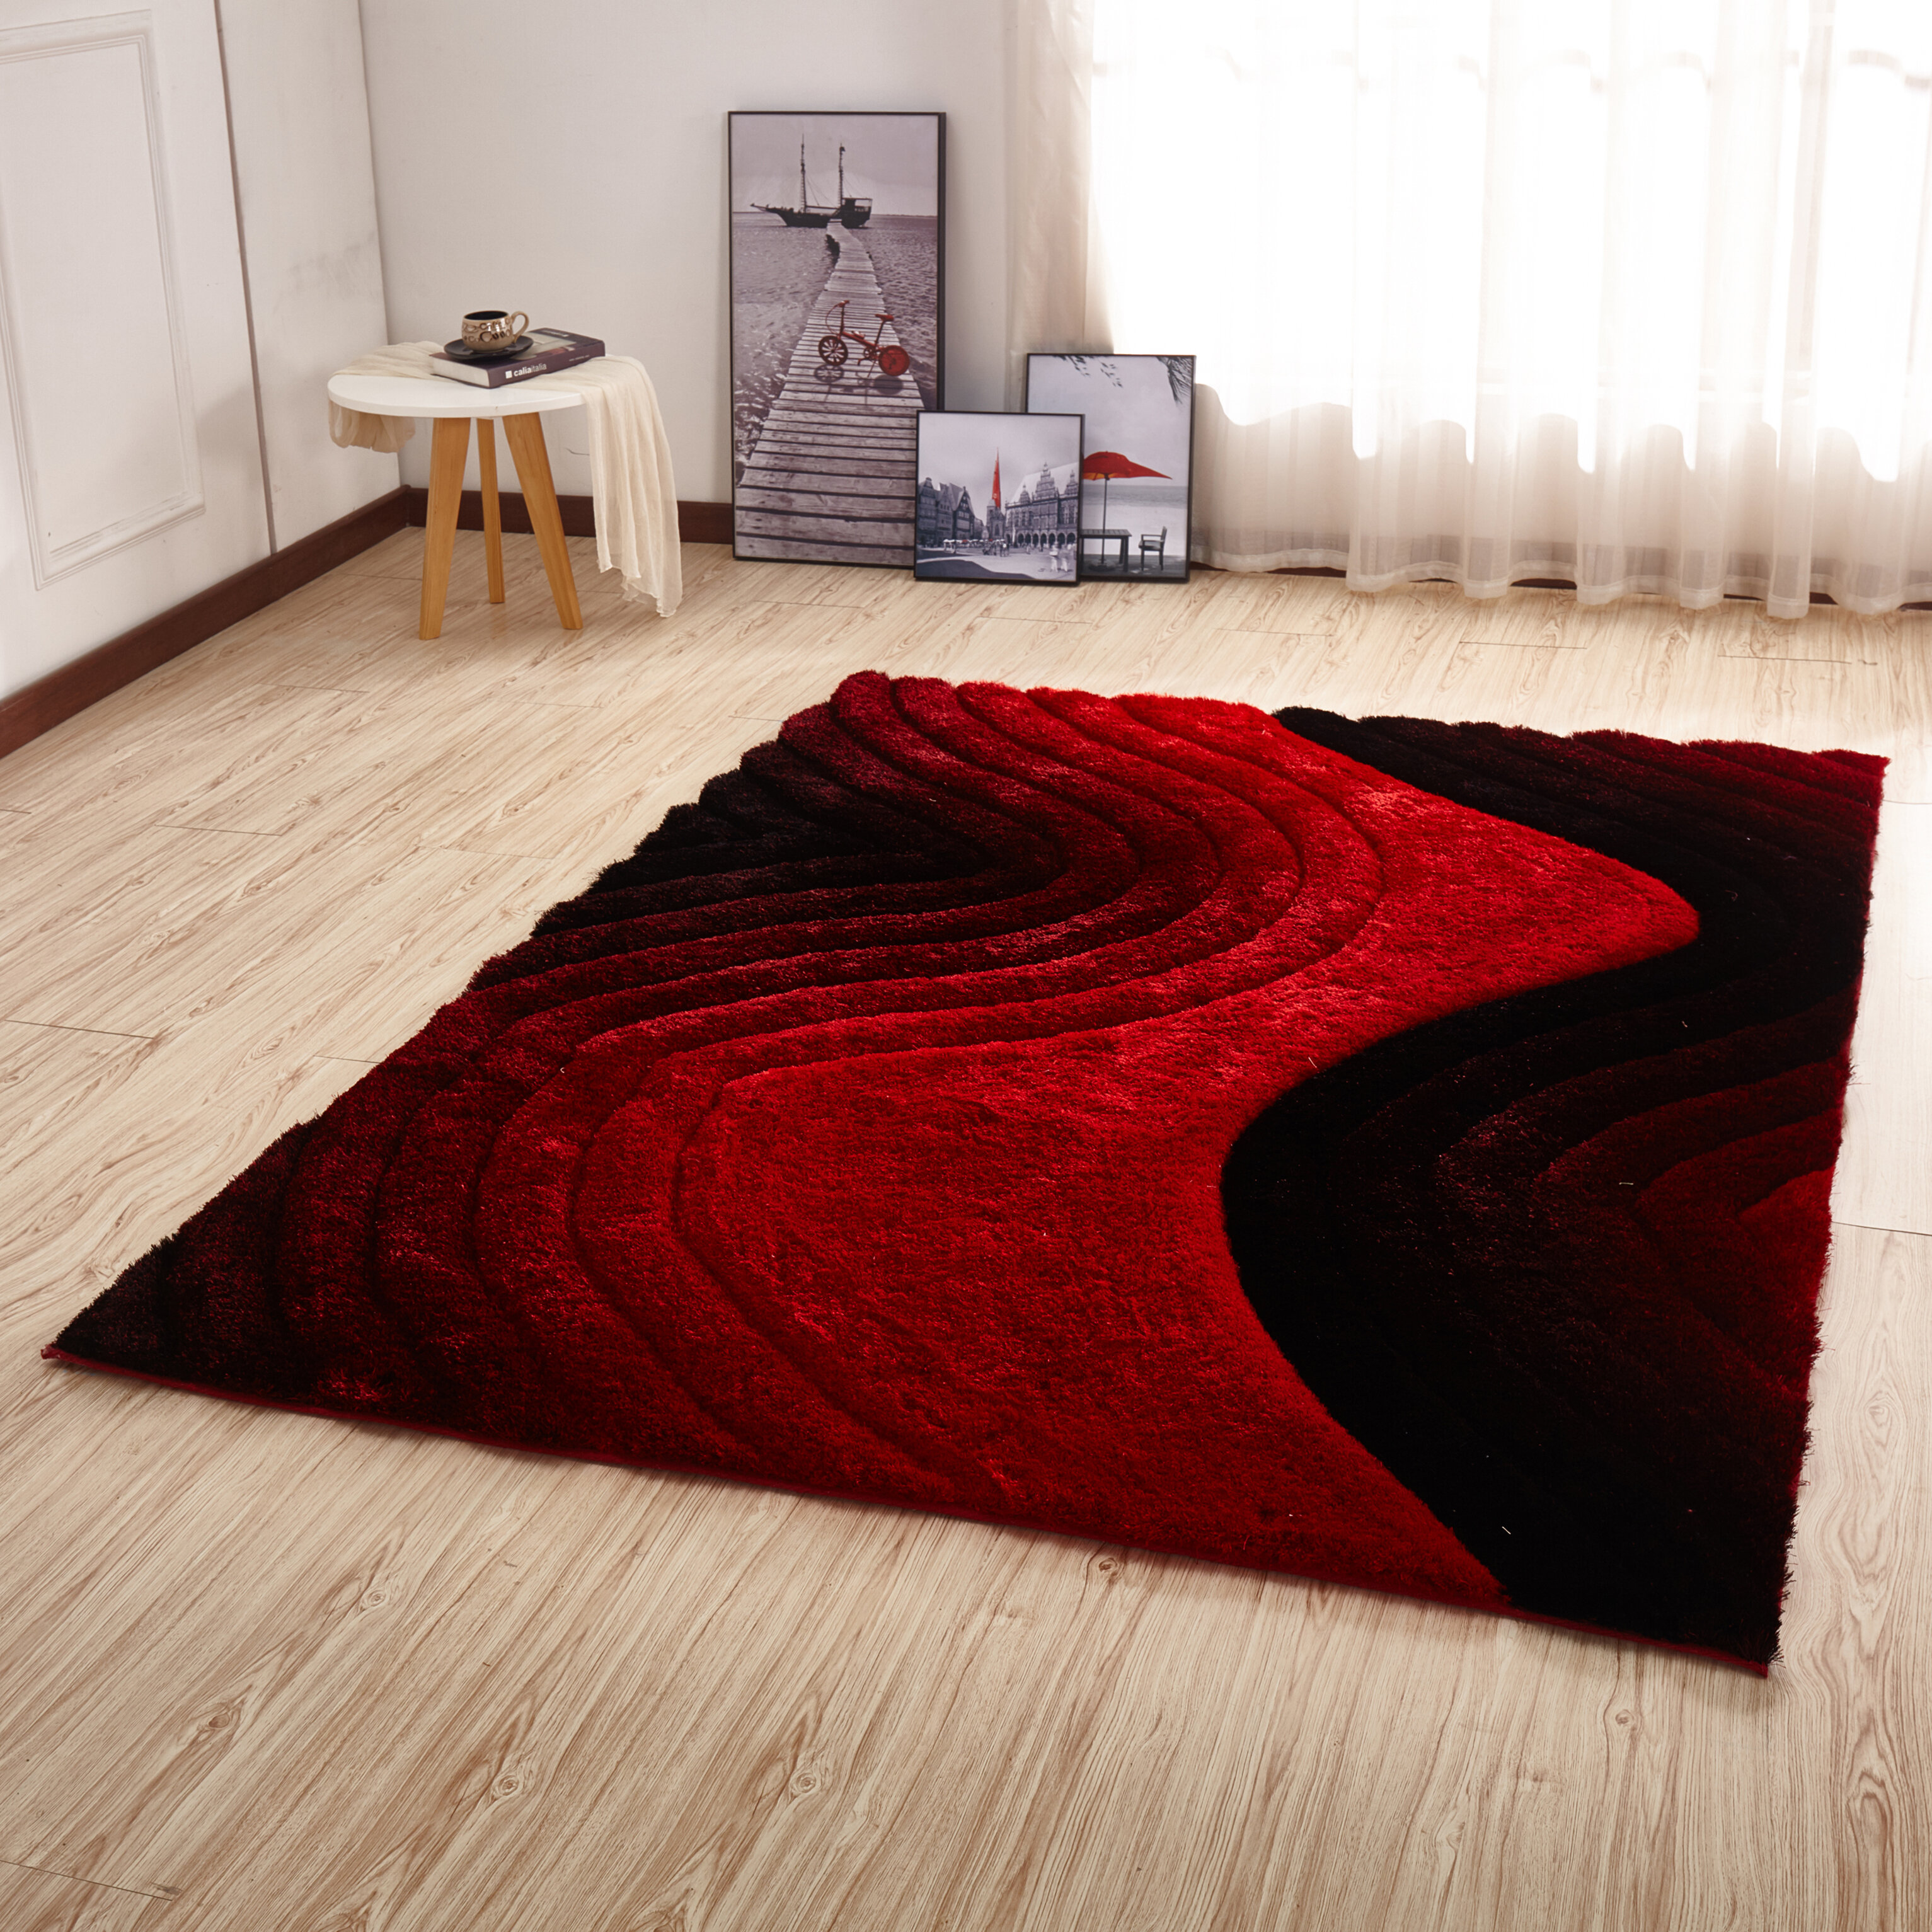 Orren Ellis Kleiber Shaggy 3d Red Black Area Rug Reviews Wayfair